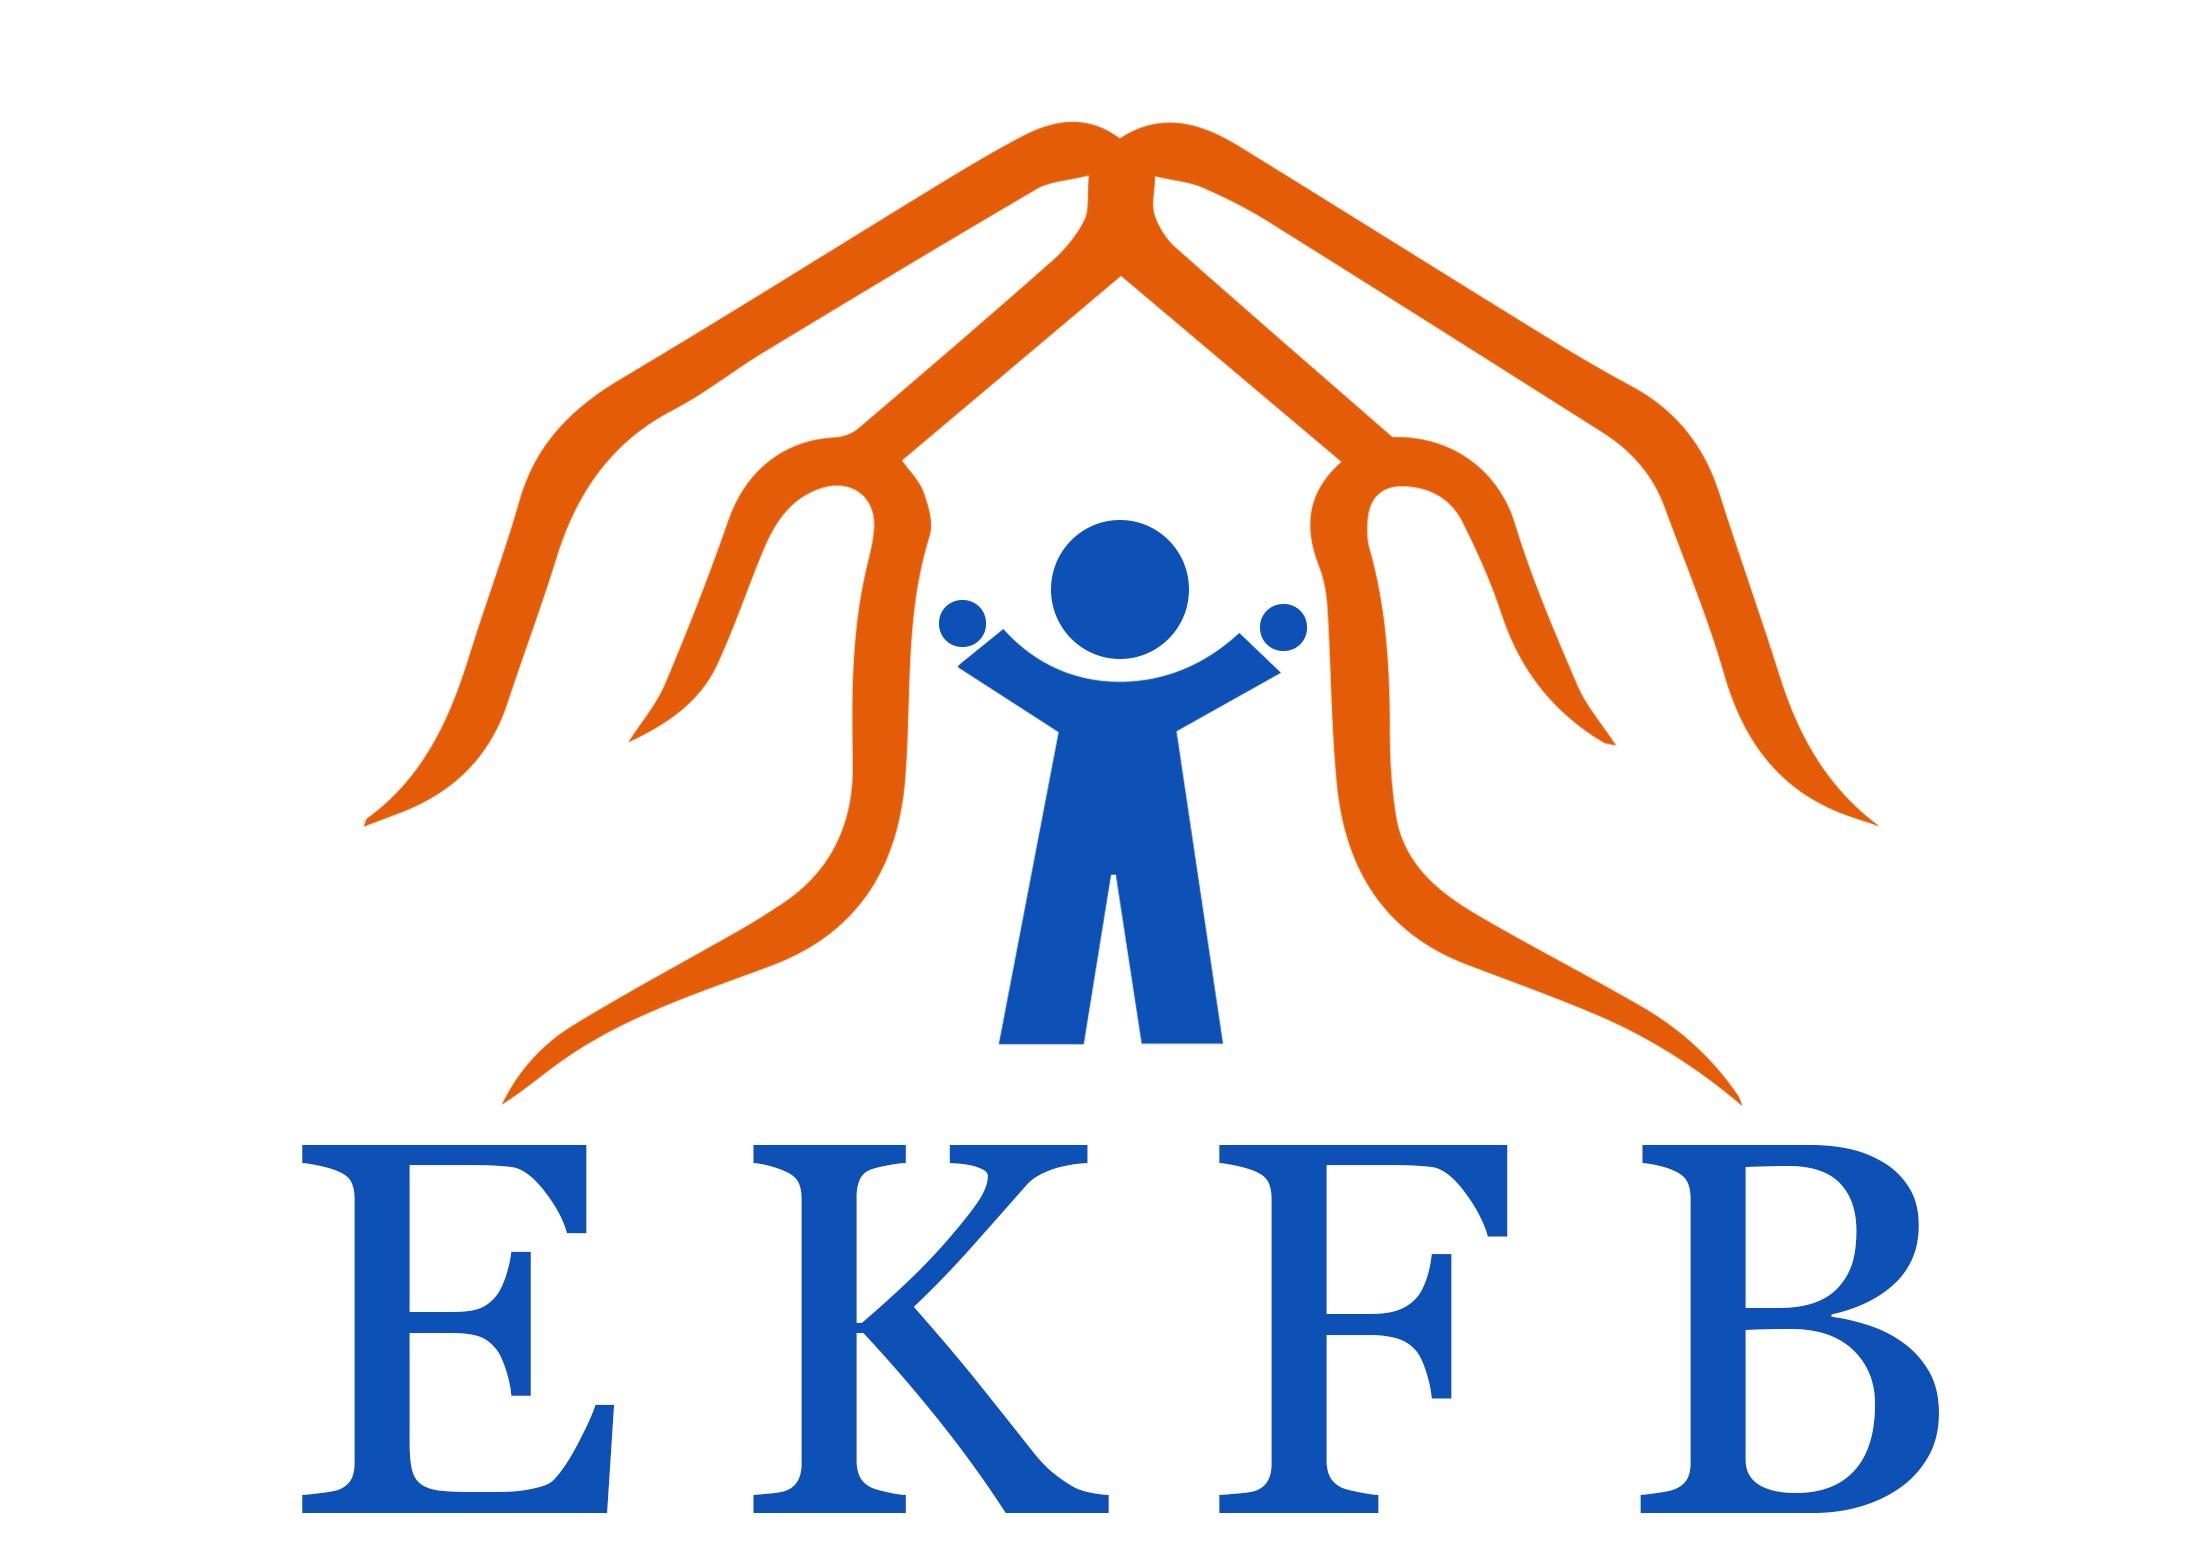 logotyp EKFB